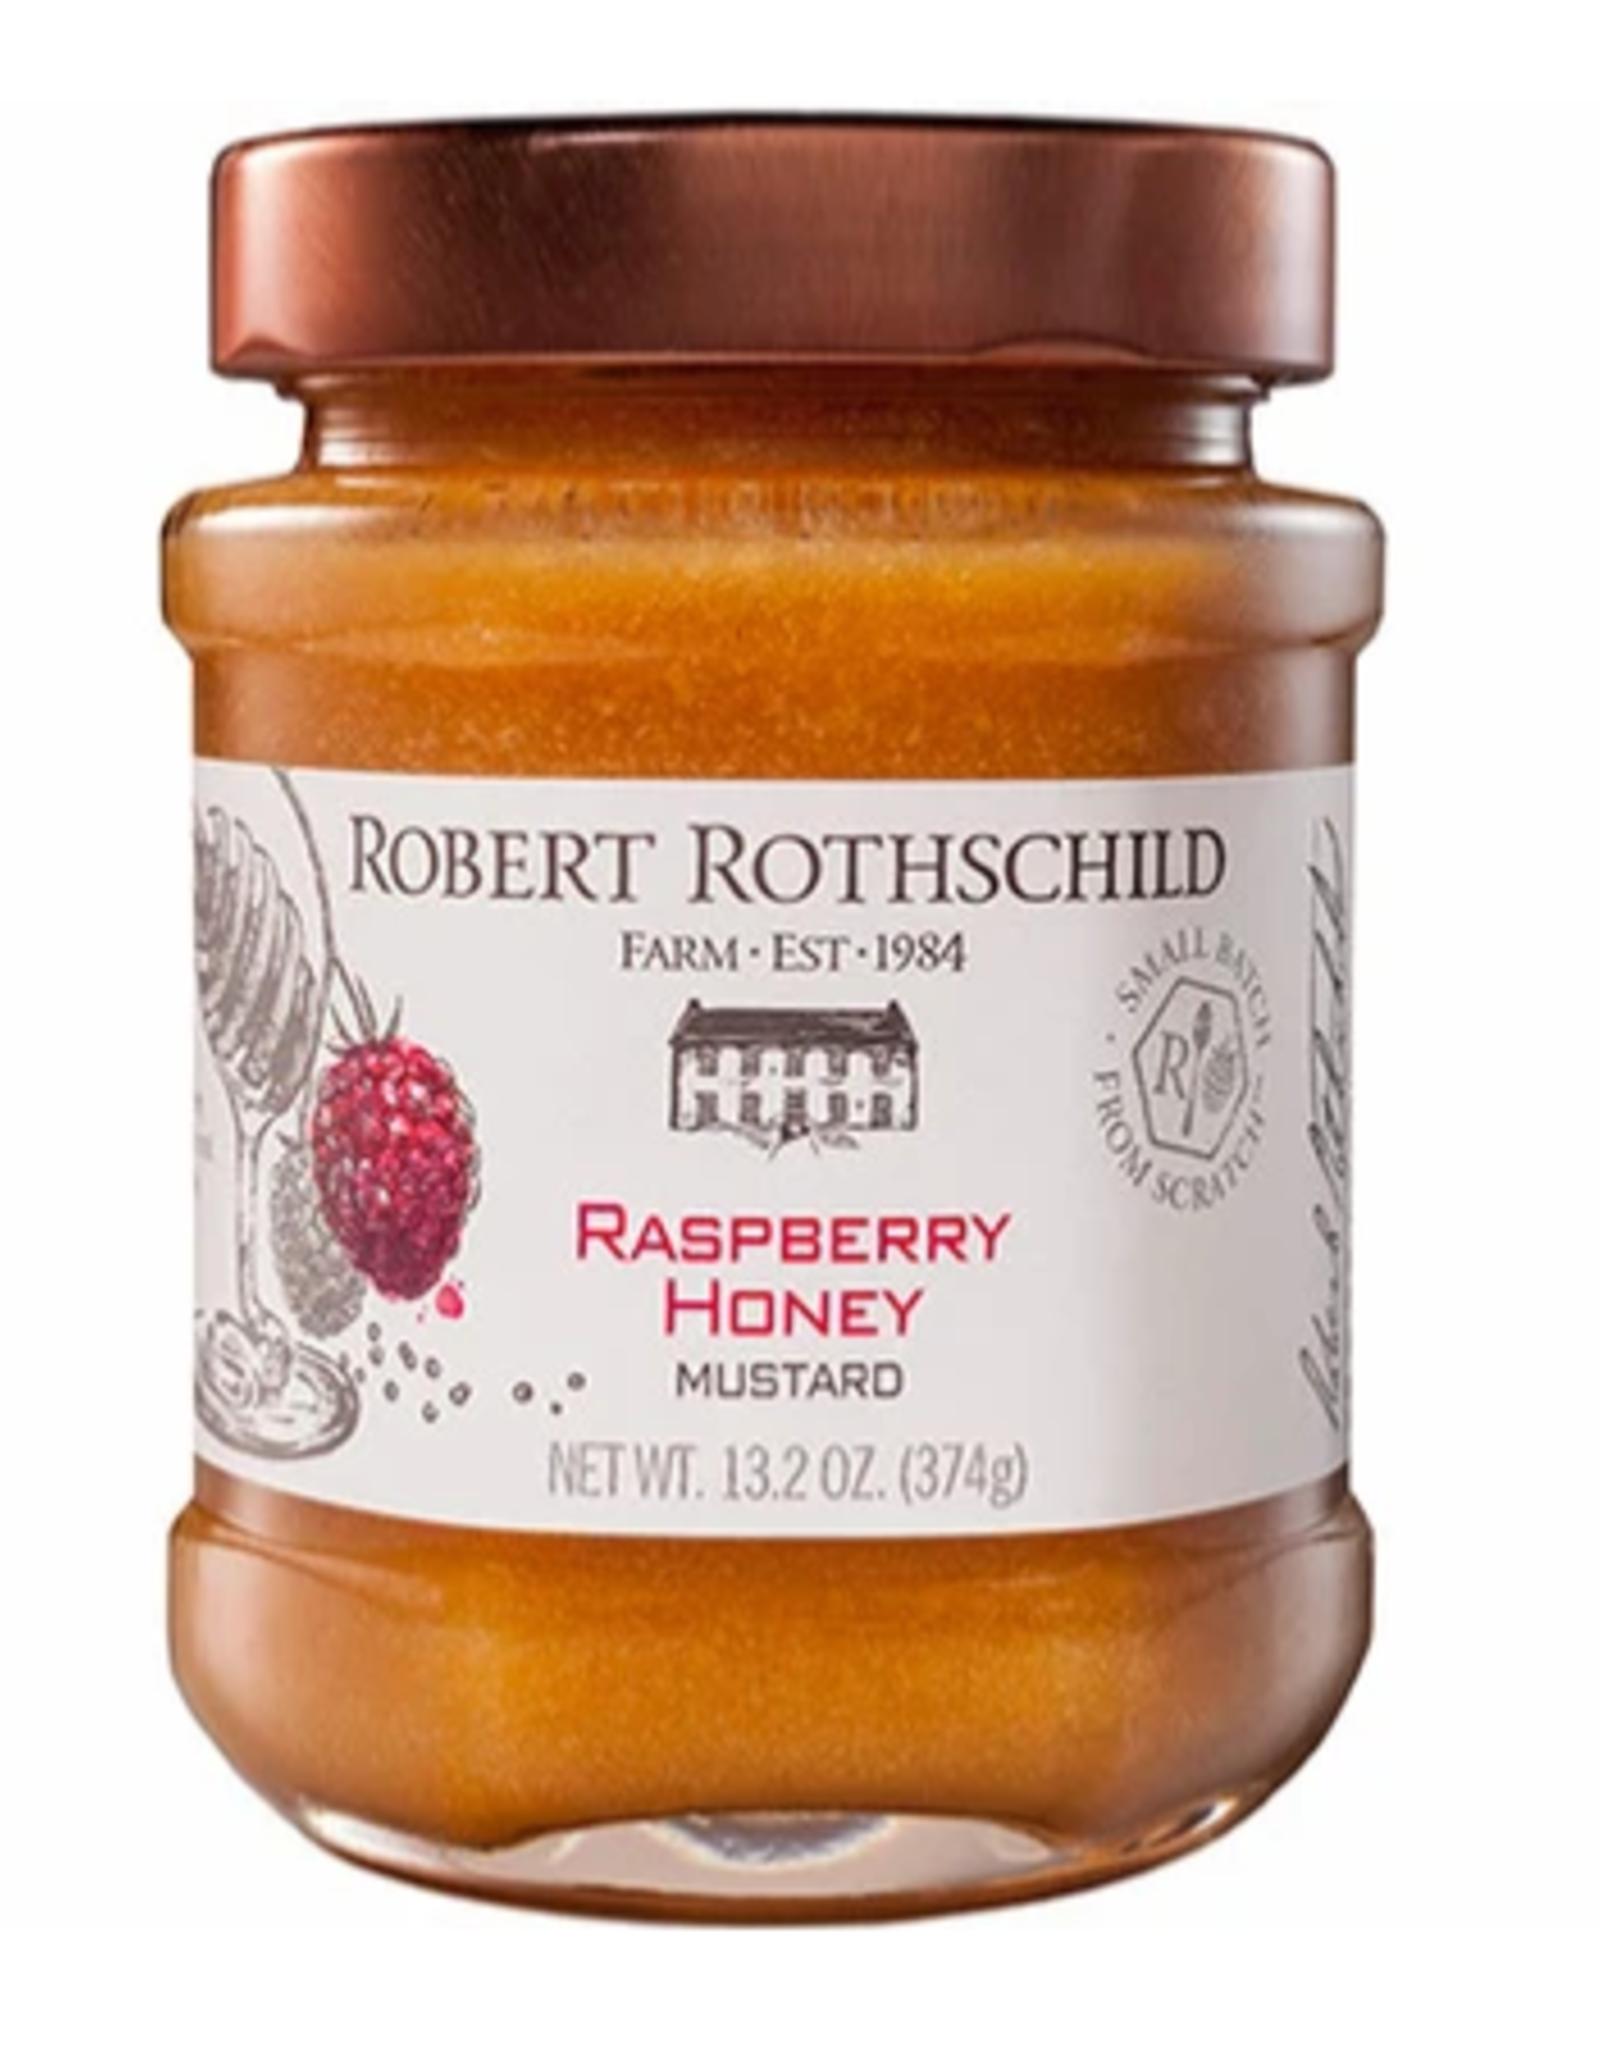 Robert Rothschild Roth Raspberry Honey Mustard Dip, 13.2oz